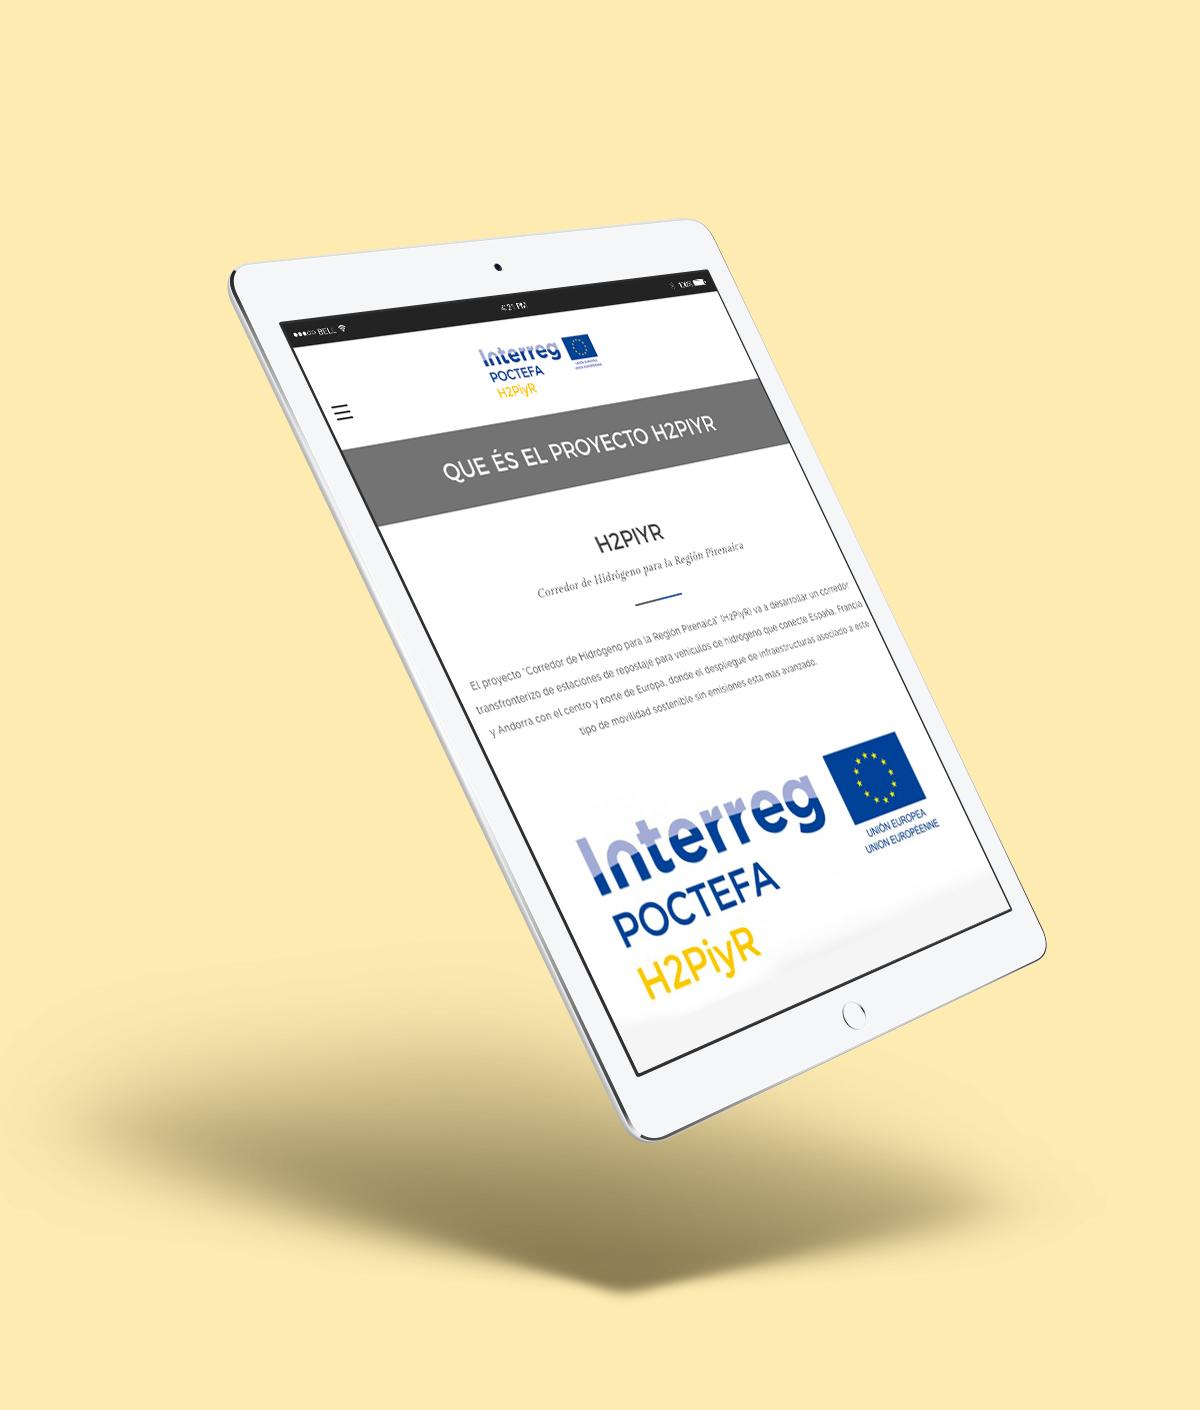 Web Proyecto H2piyR FHA tablet